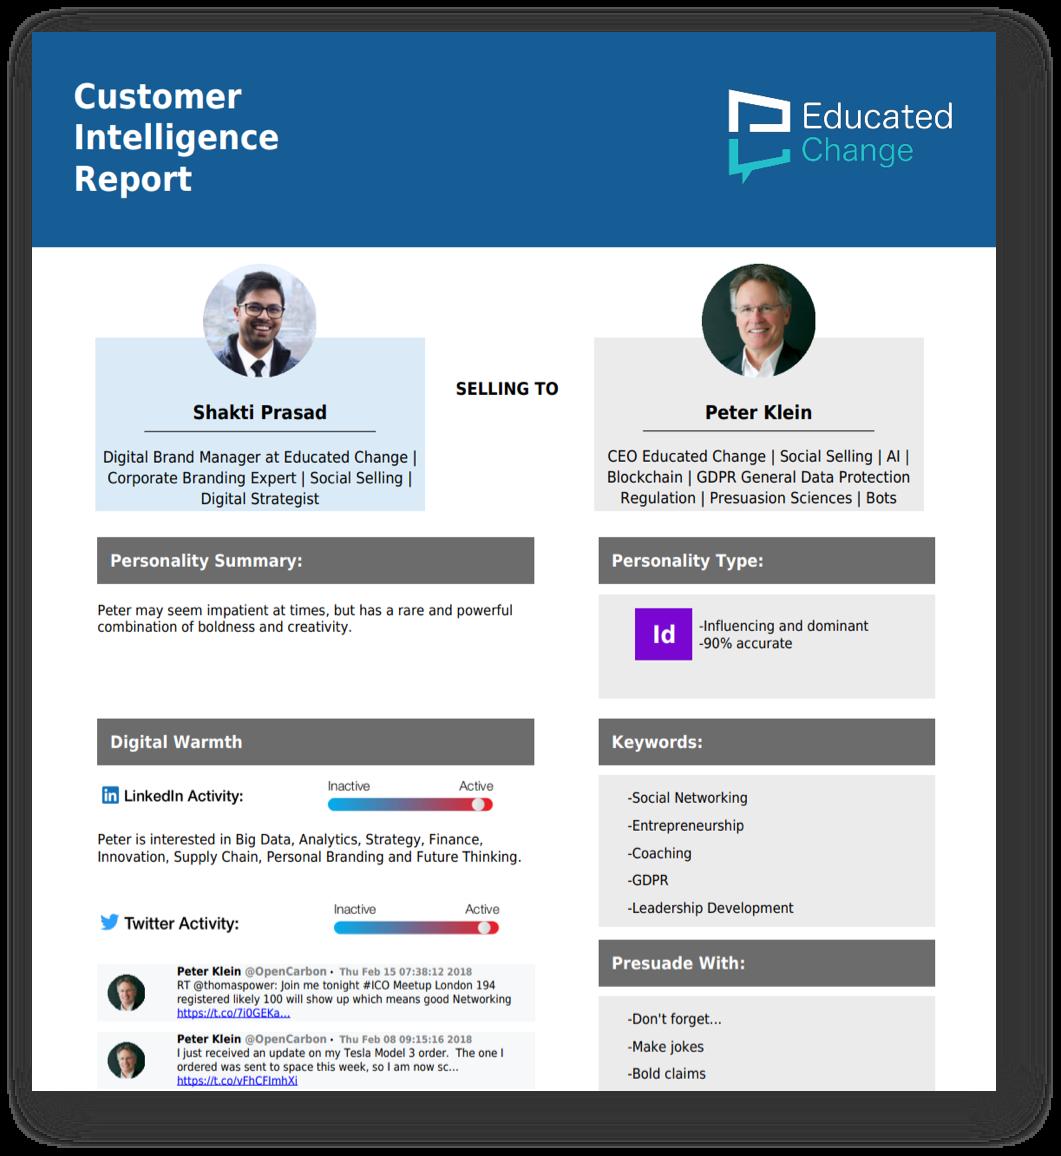 Educated-Change-Customer-Intelligence-AI-LinkedIn-Twitter.png